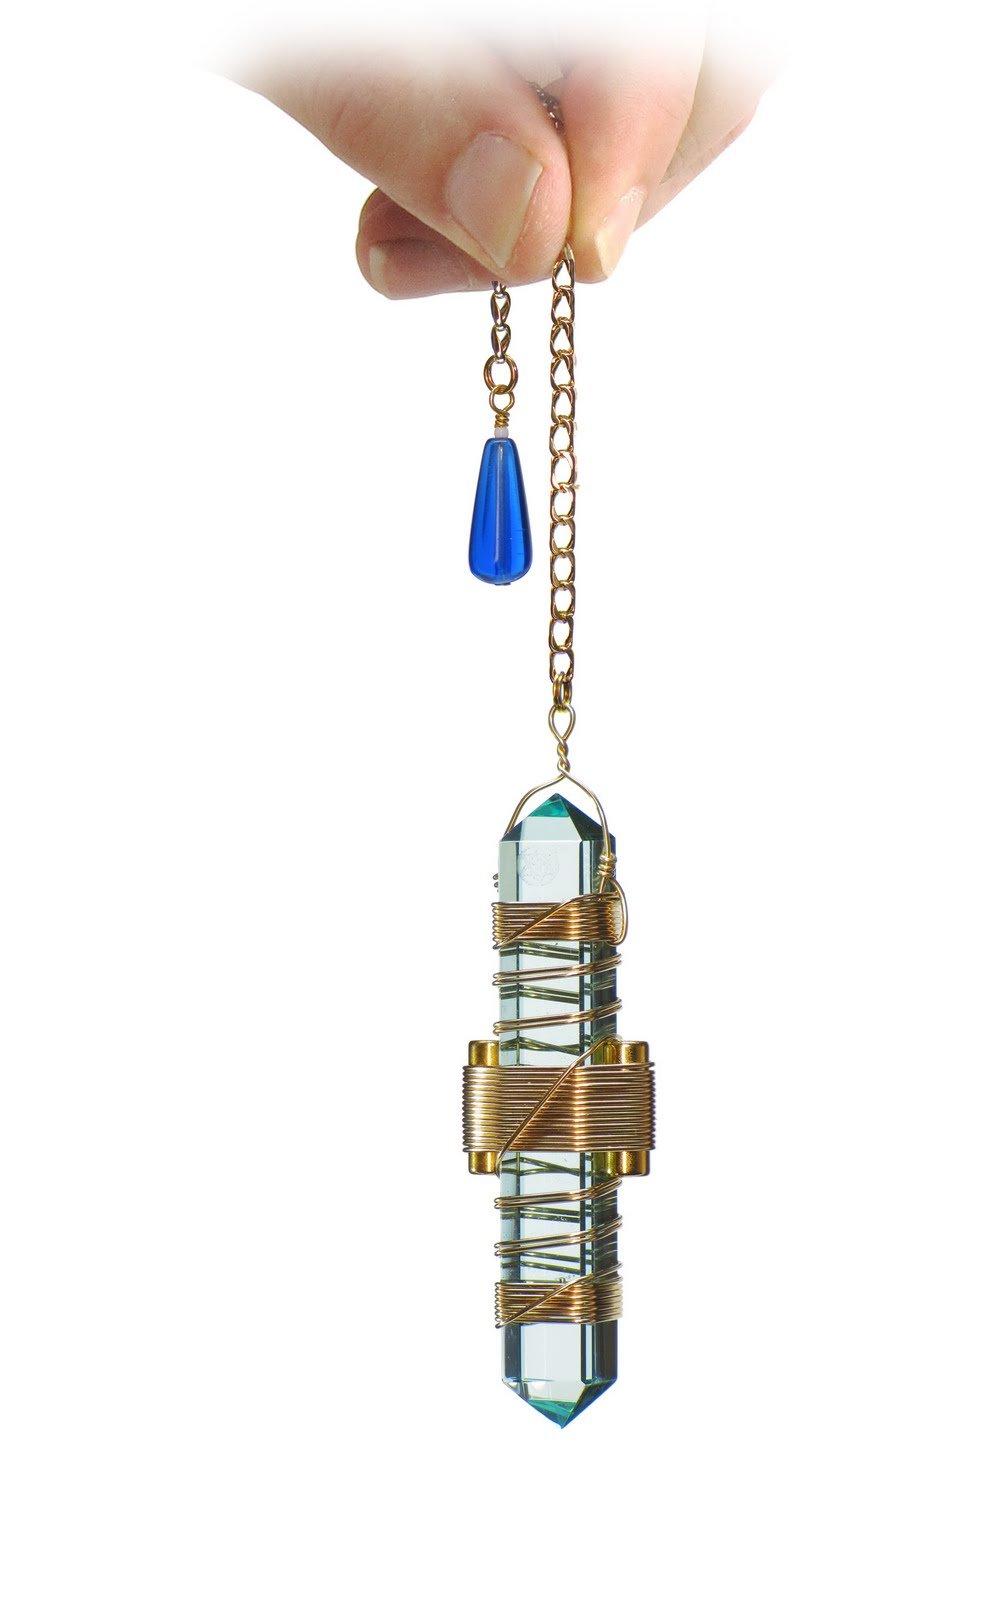 3.5'' Buddha Maitreya the Christ Etheric Weaver® in Gold Wire - Quartz Crystal Vibrational Healing Tool